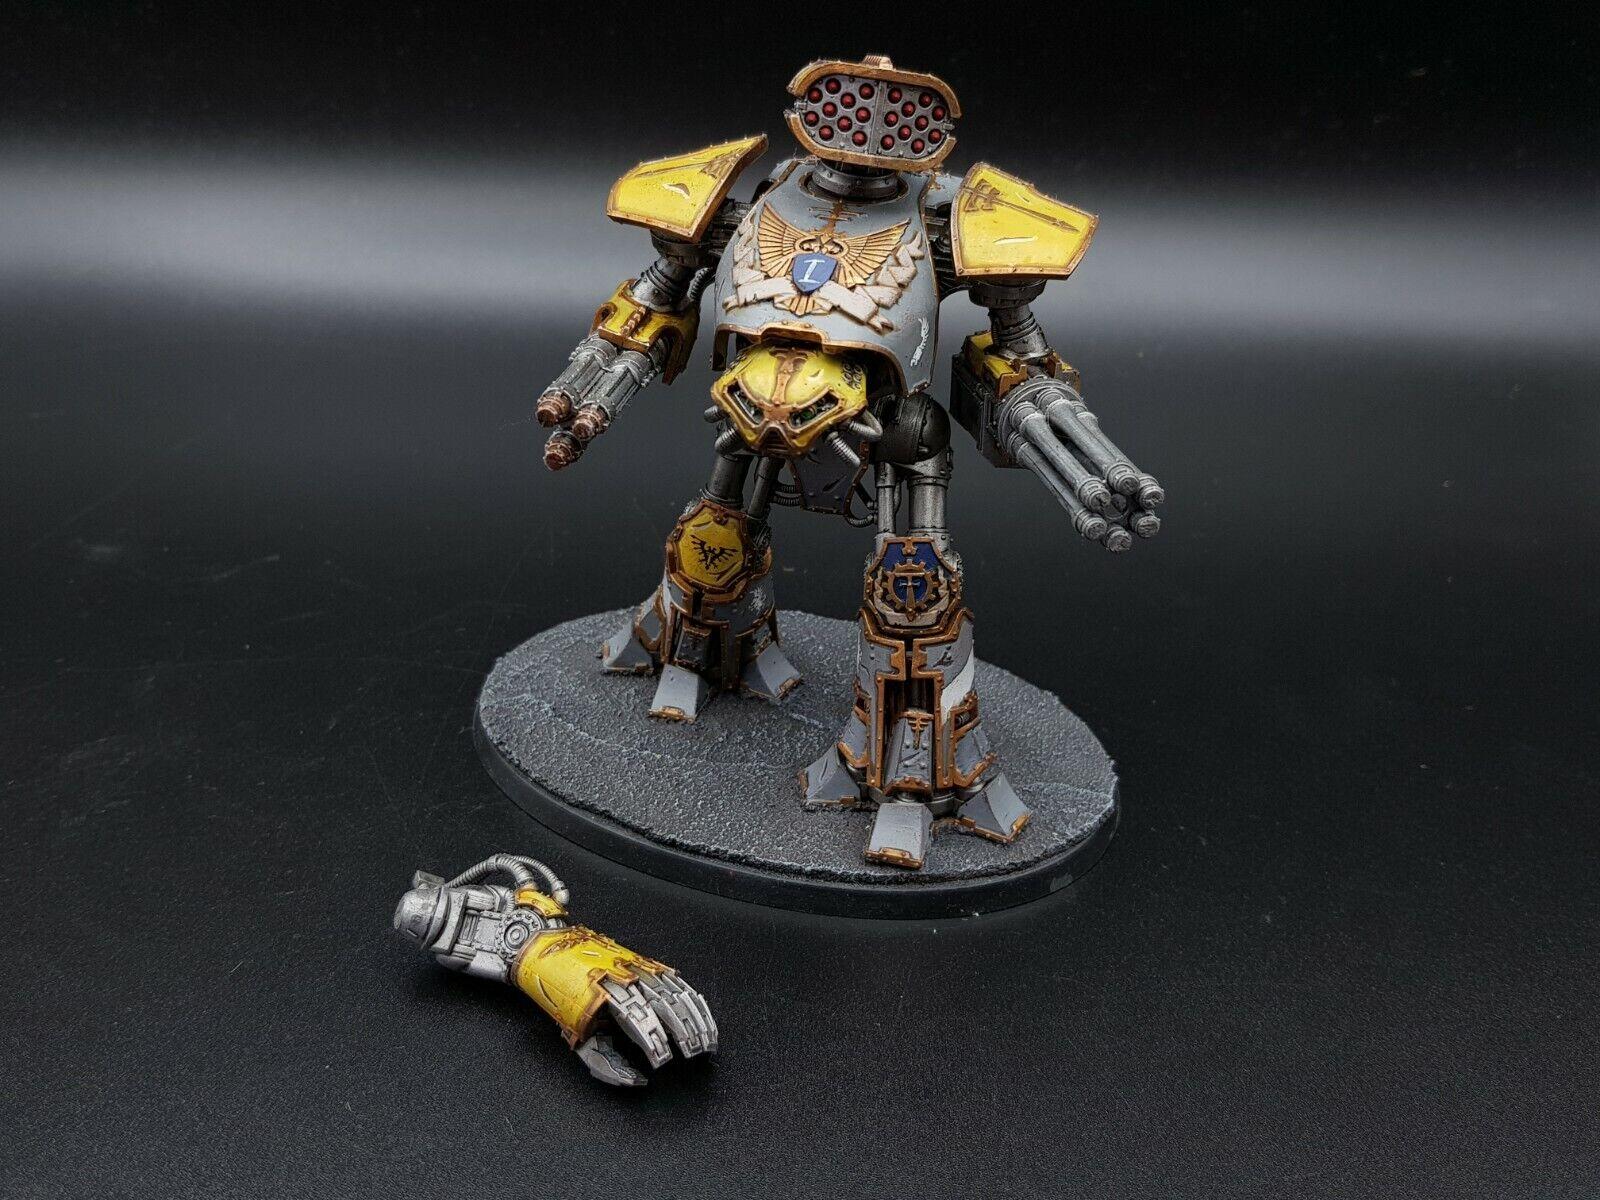 Warhammer 40k Adeptus Titanicus Reaver Titan Magnetized Pro Painted Painted  2 R2S1B2